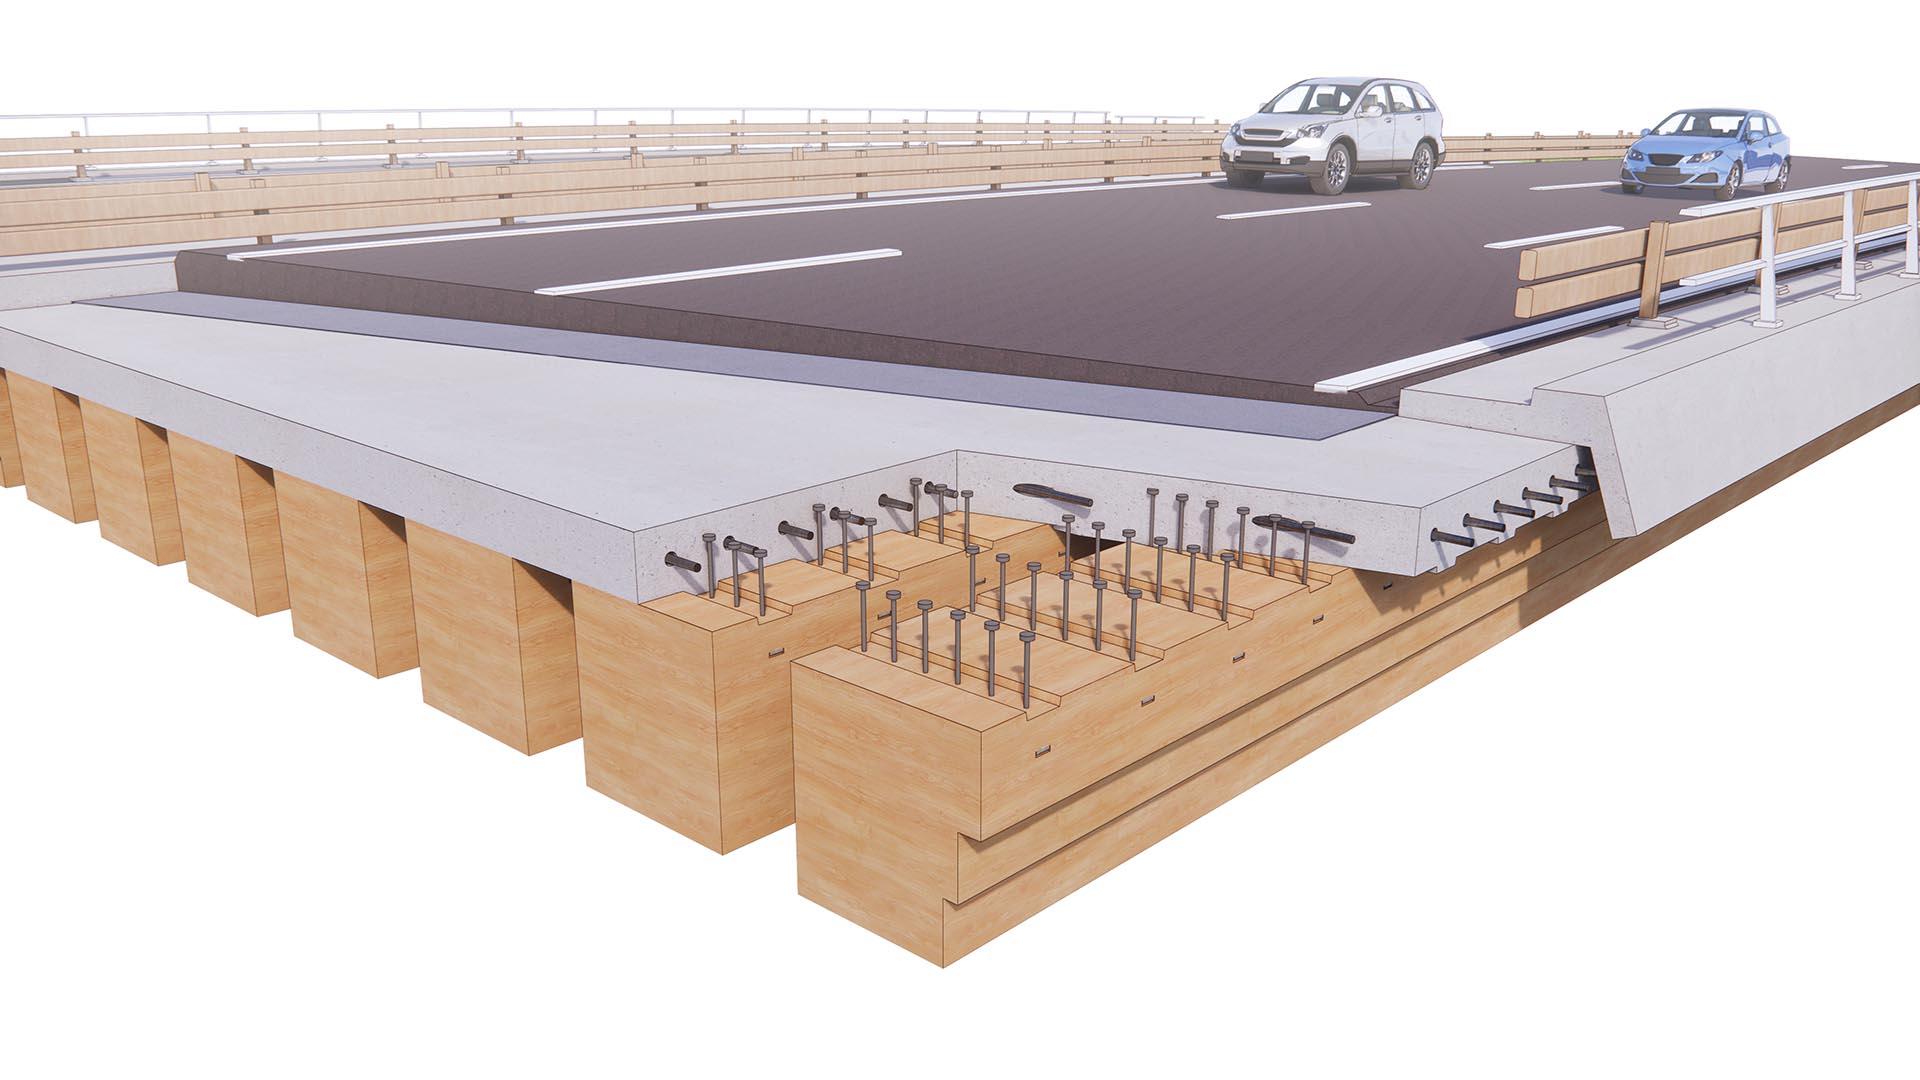 Opbouw_circulair-viaduct-houten-liggers-betonnen-toplaag-Mobilis-ipvDelft